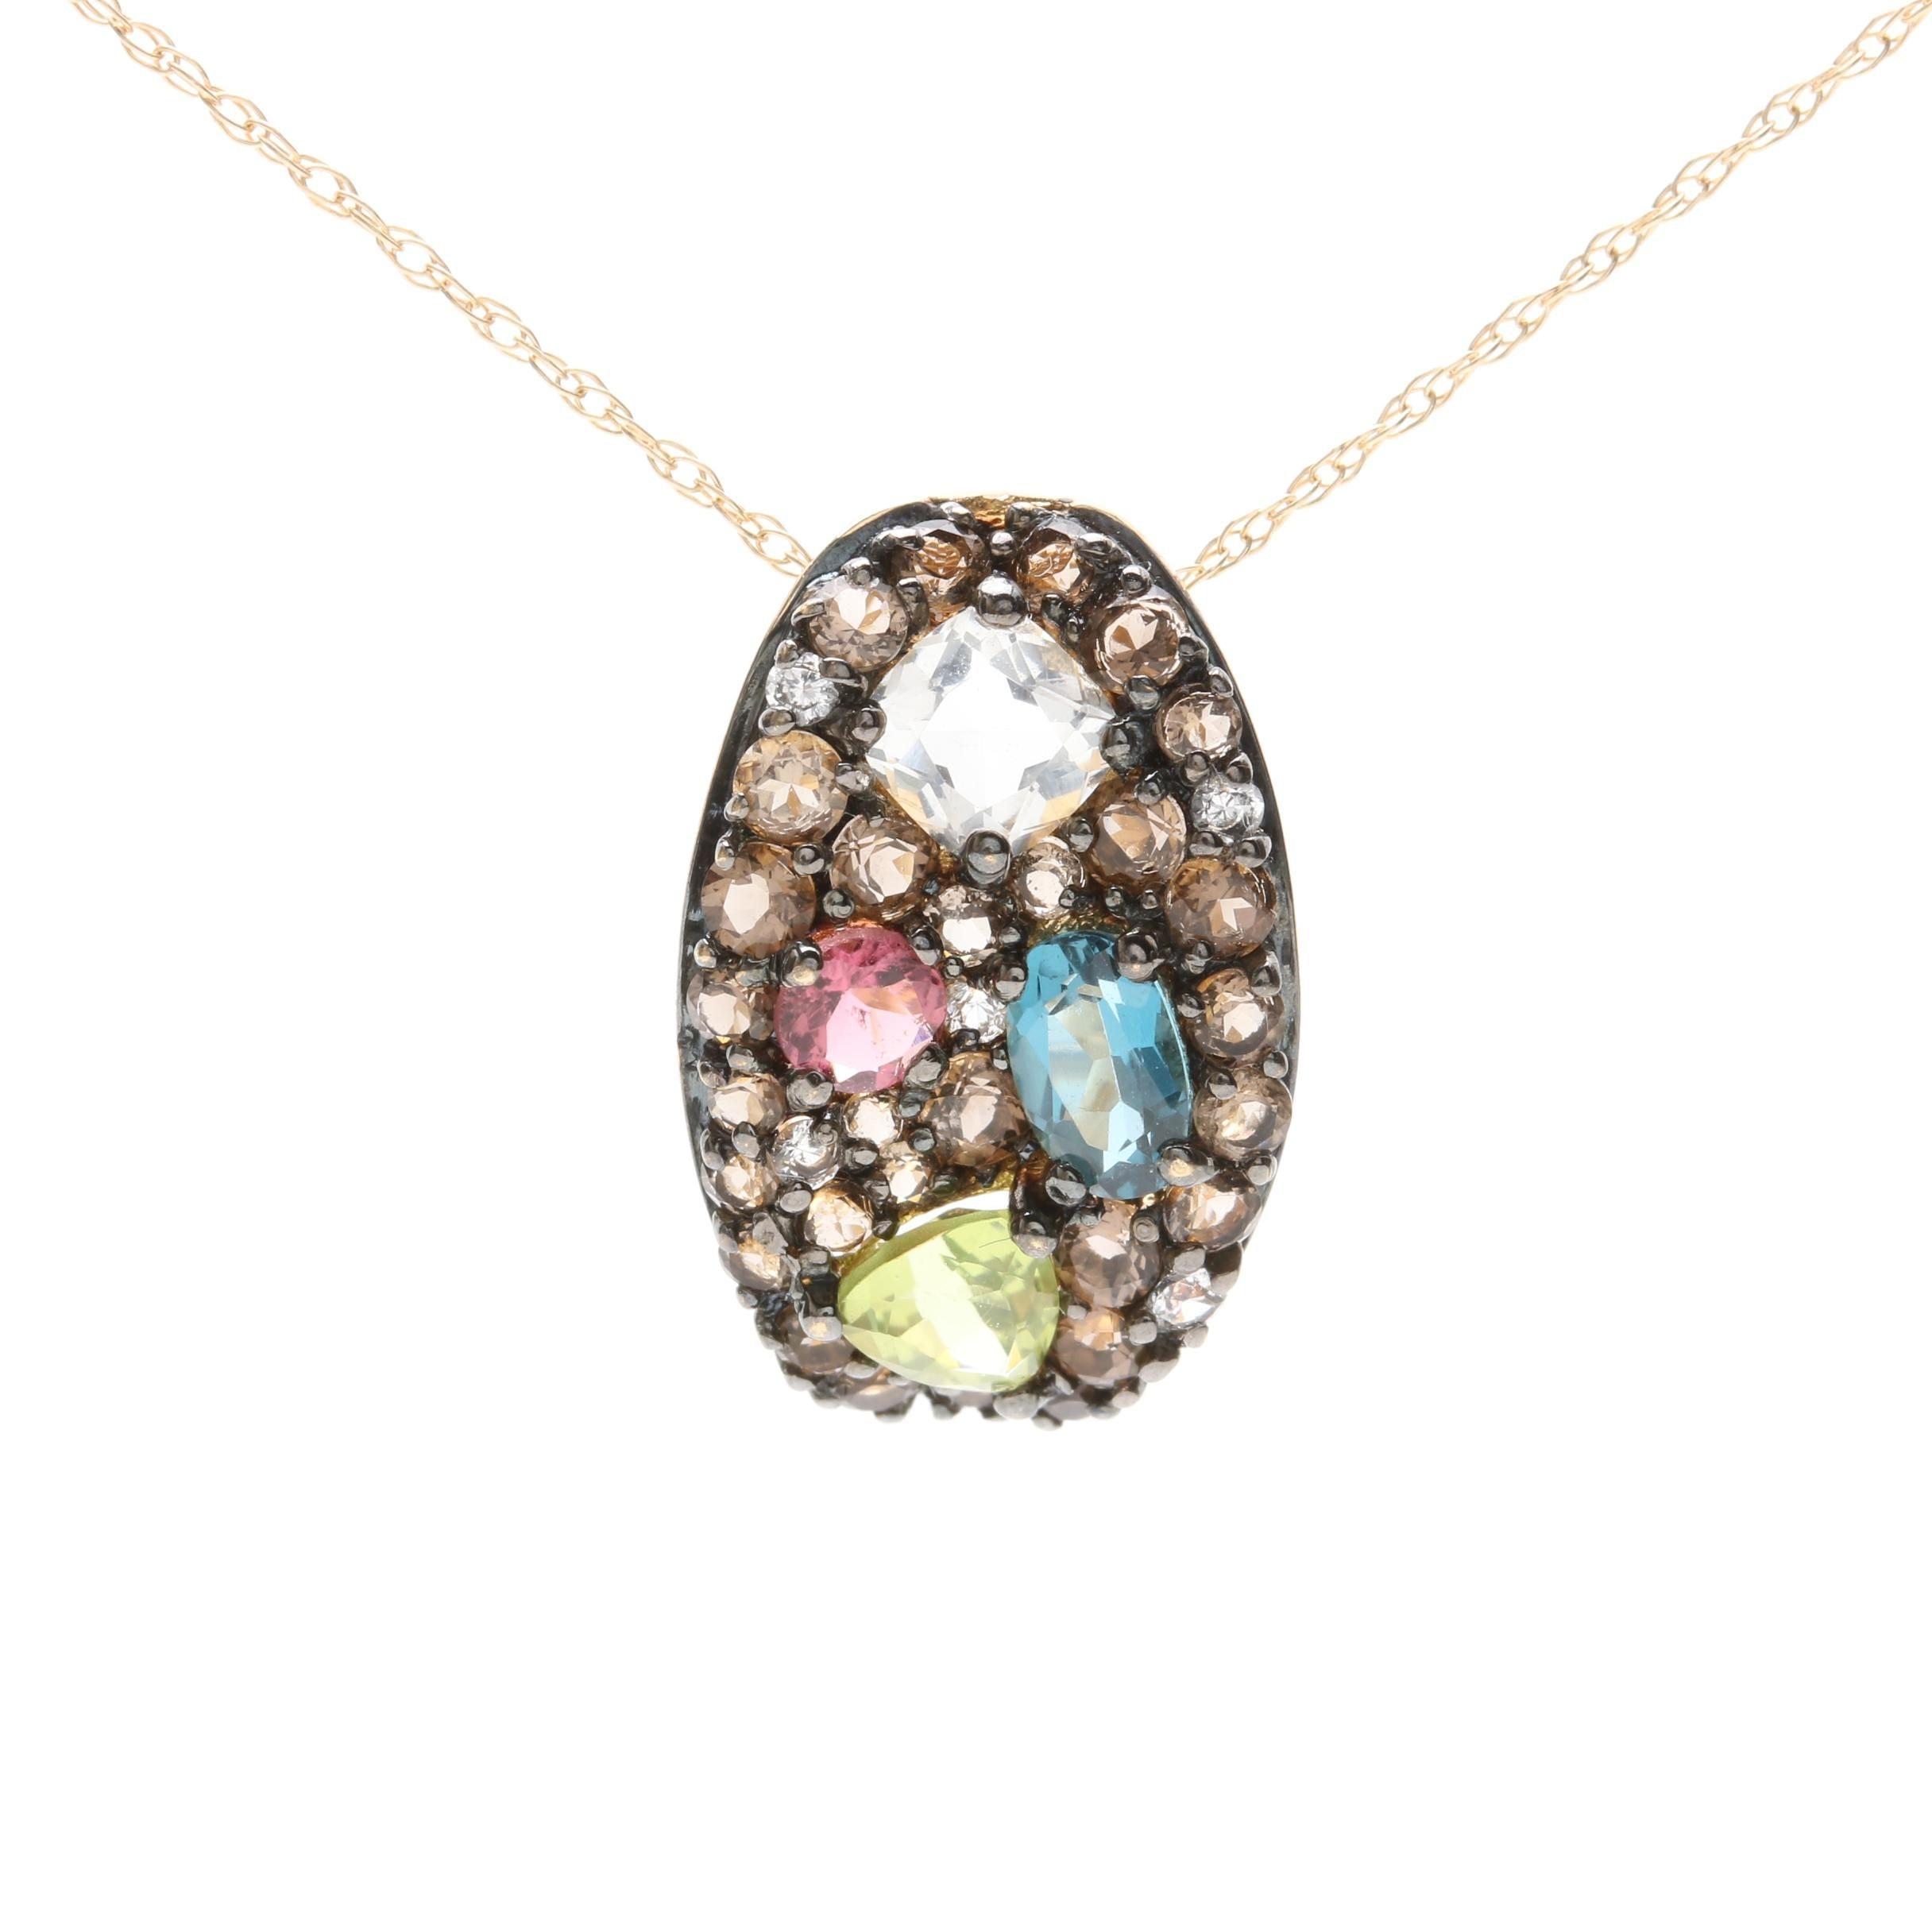 10K Yellow Gold Gemstone Pendant Necklace